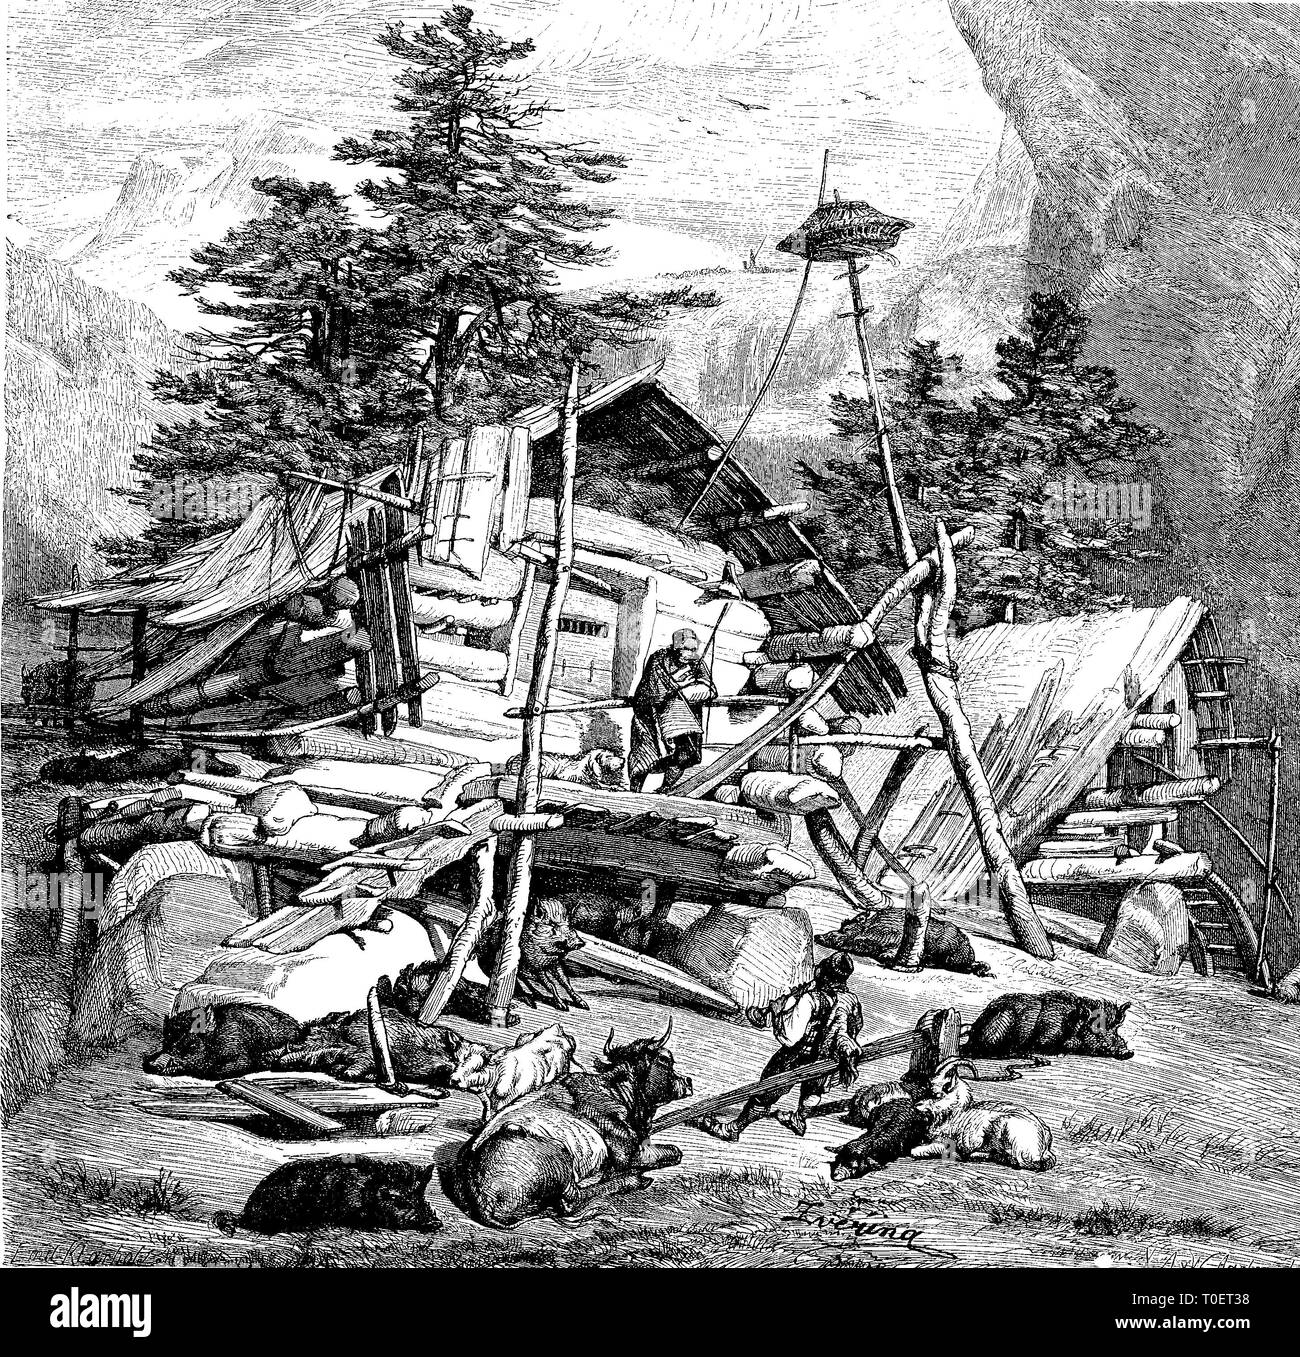 a primitive chalet on the high mountains of Hercegovina, Bosnia and Herzegovina  /  Eine promitive Sennhütte auf dem Hochgebirge der Herzegovina, Bosnien und Herzegowina - Stock Image